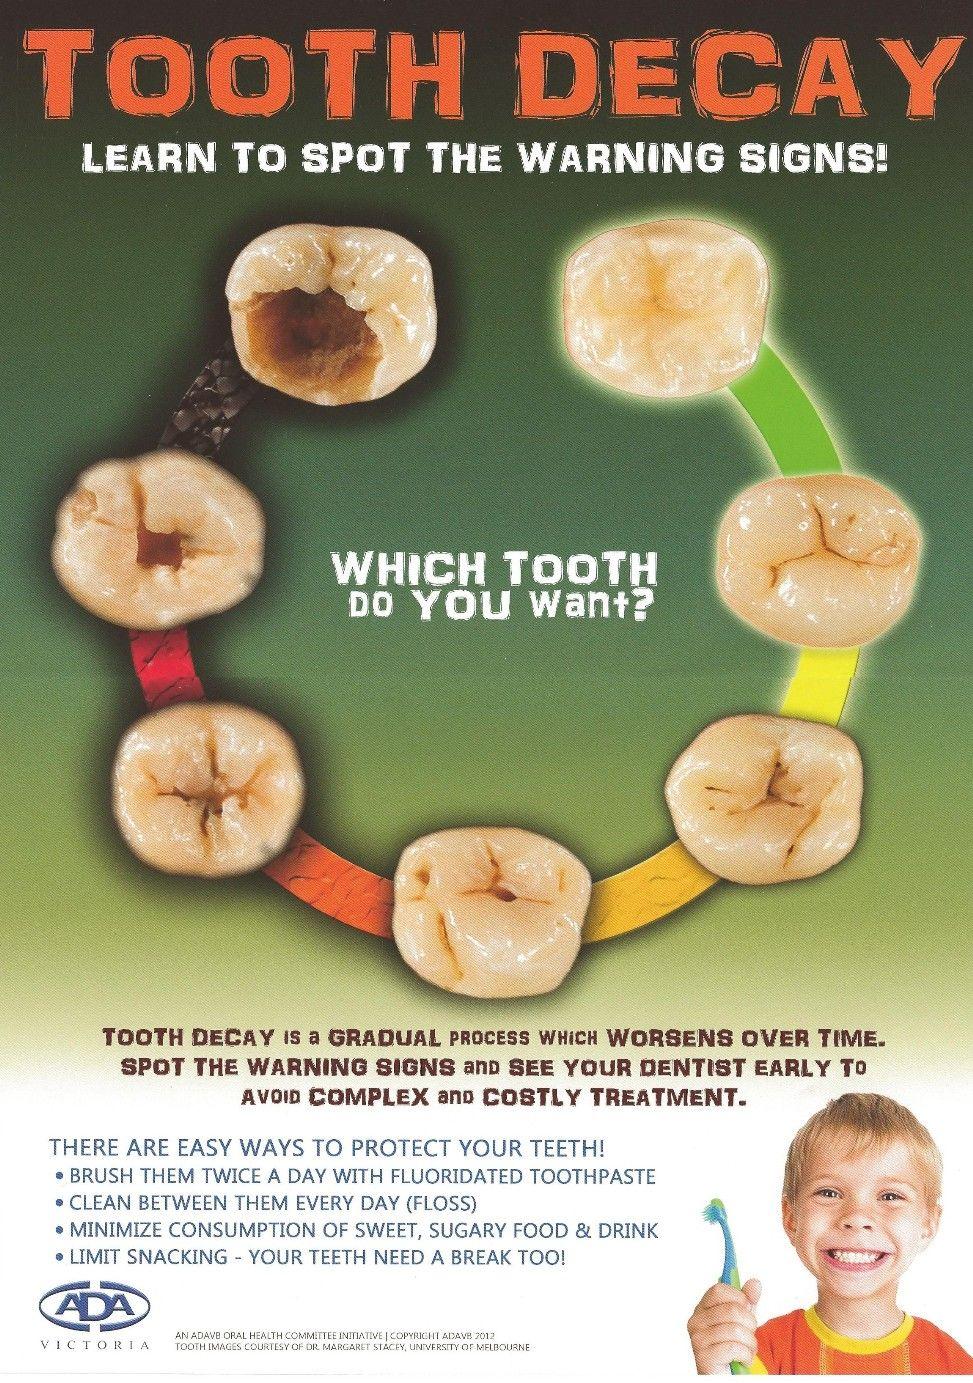 How to Get Rid of Cavities | Dental, Dental hygiene school ...